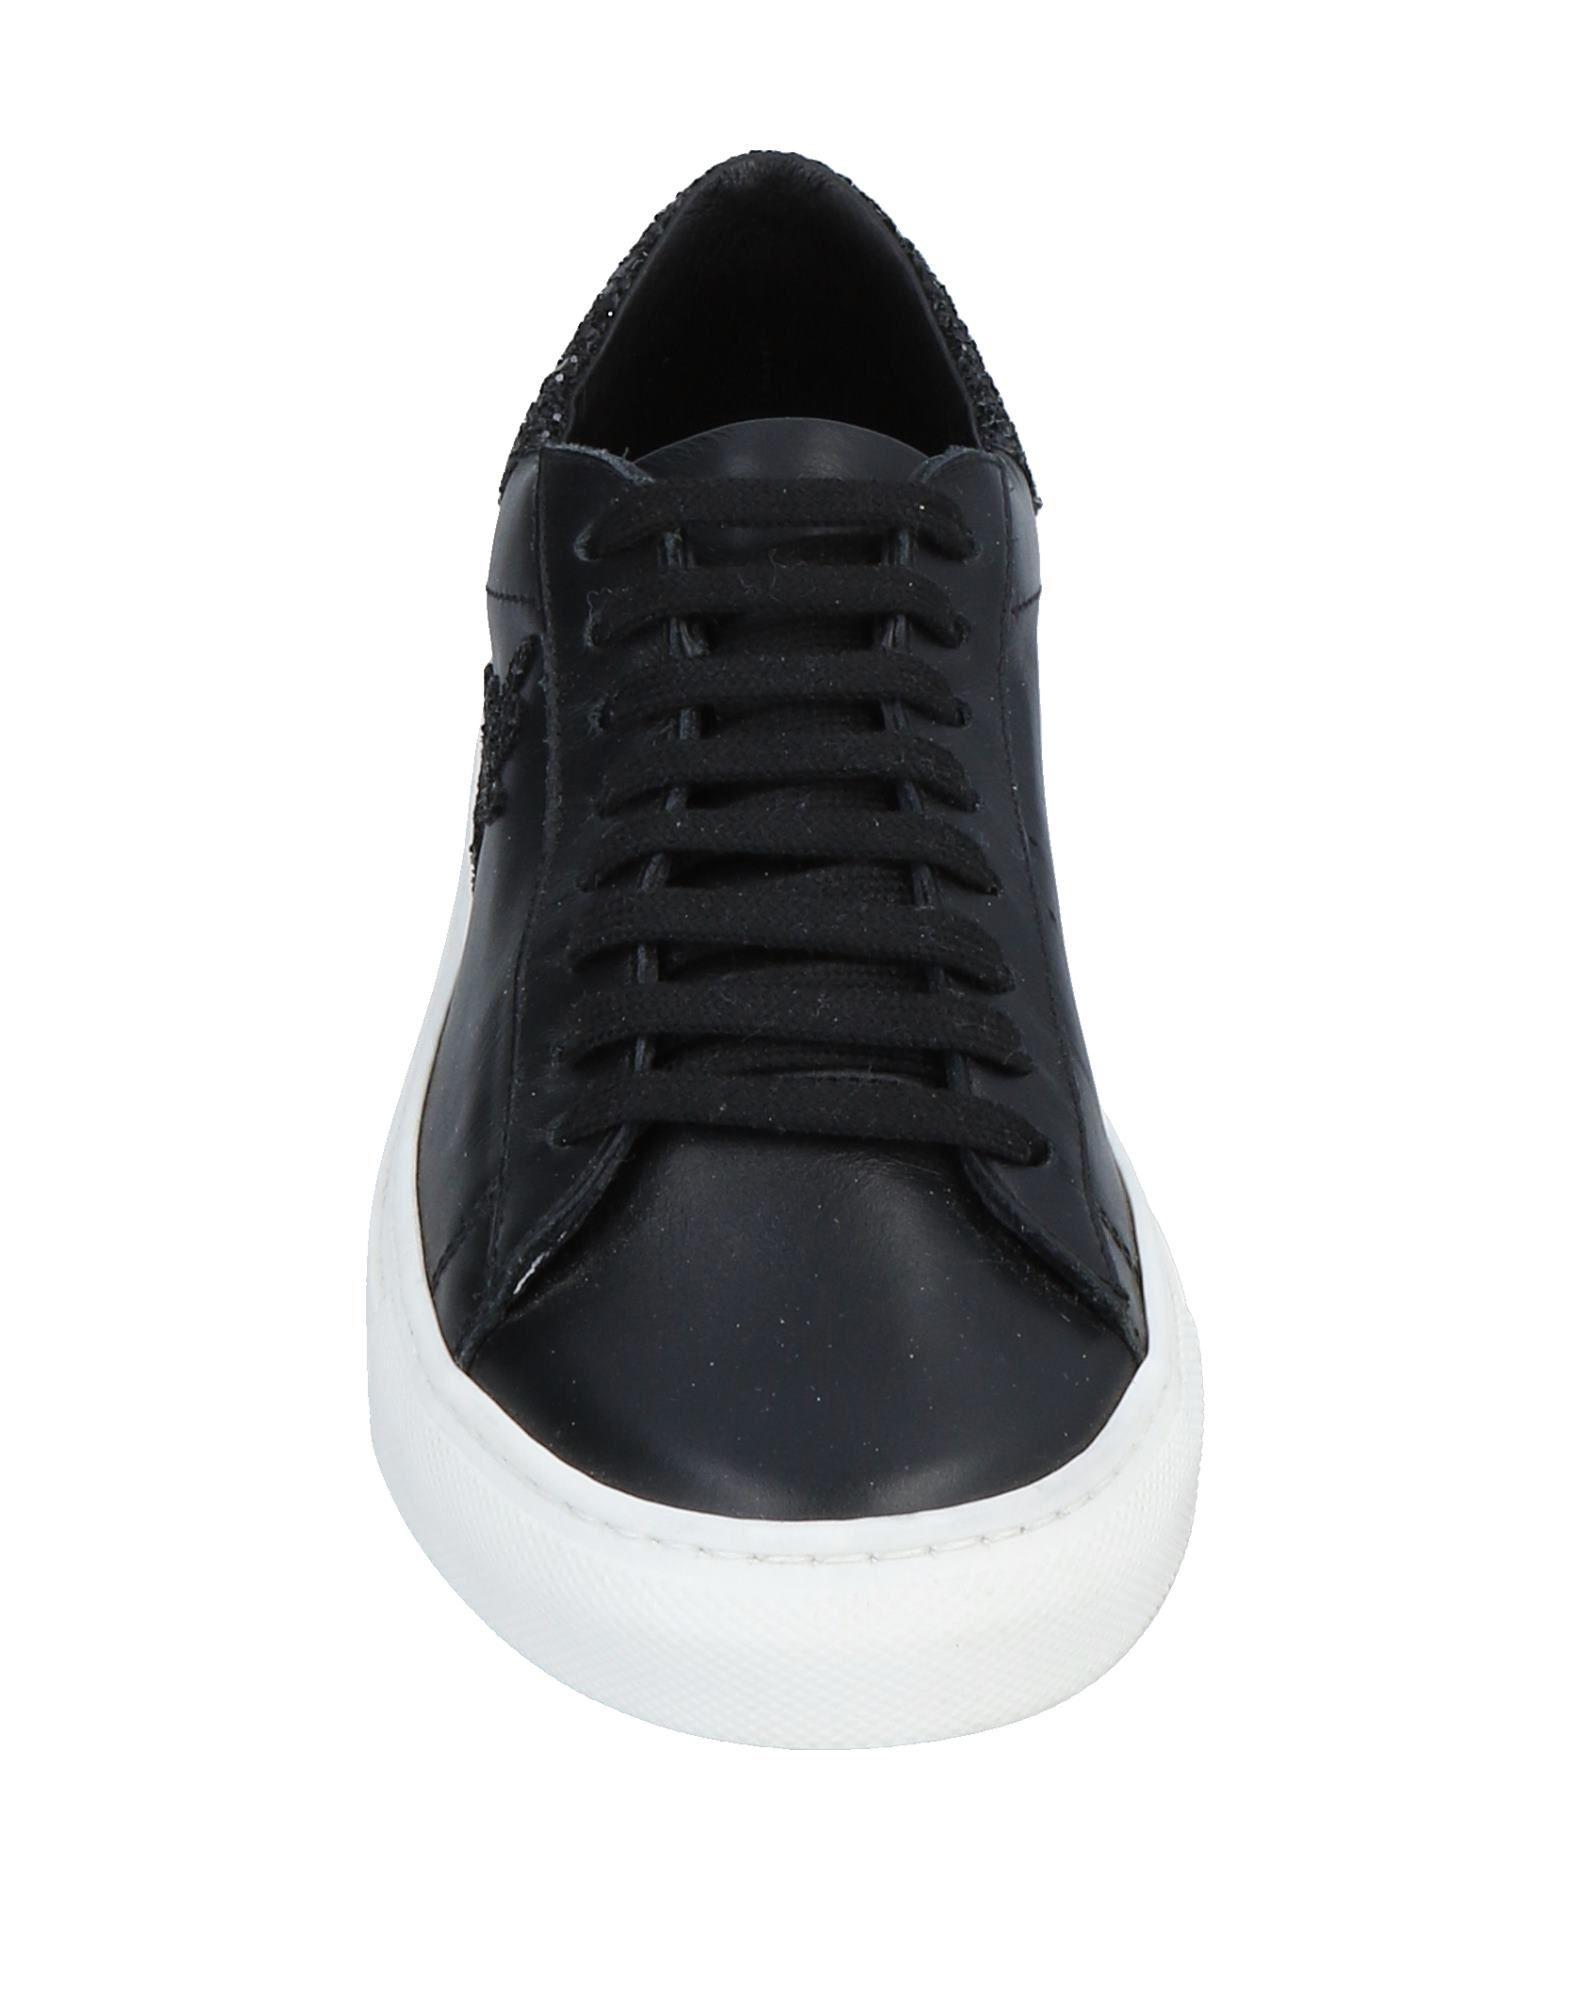 Gut um billige Schuhe zu tragenPatrizia 11567163KF Pepe Sneakers Damen  11567163KF tragenPatrizia 5fc548